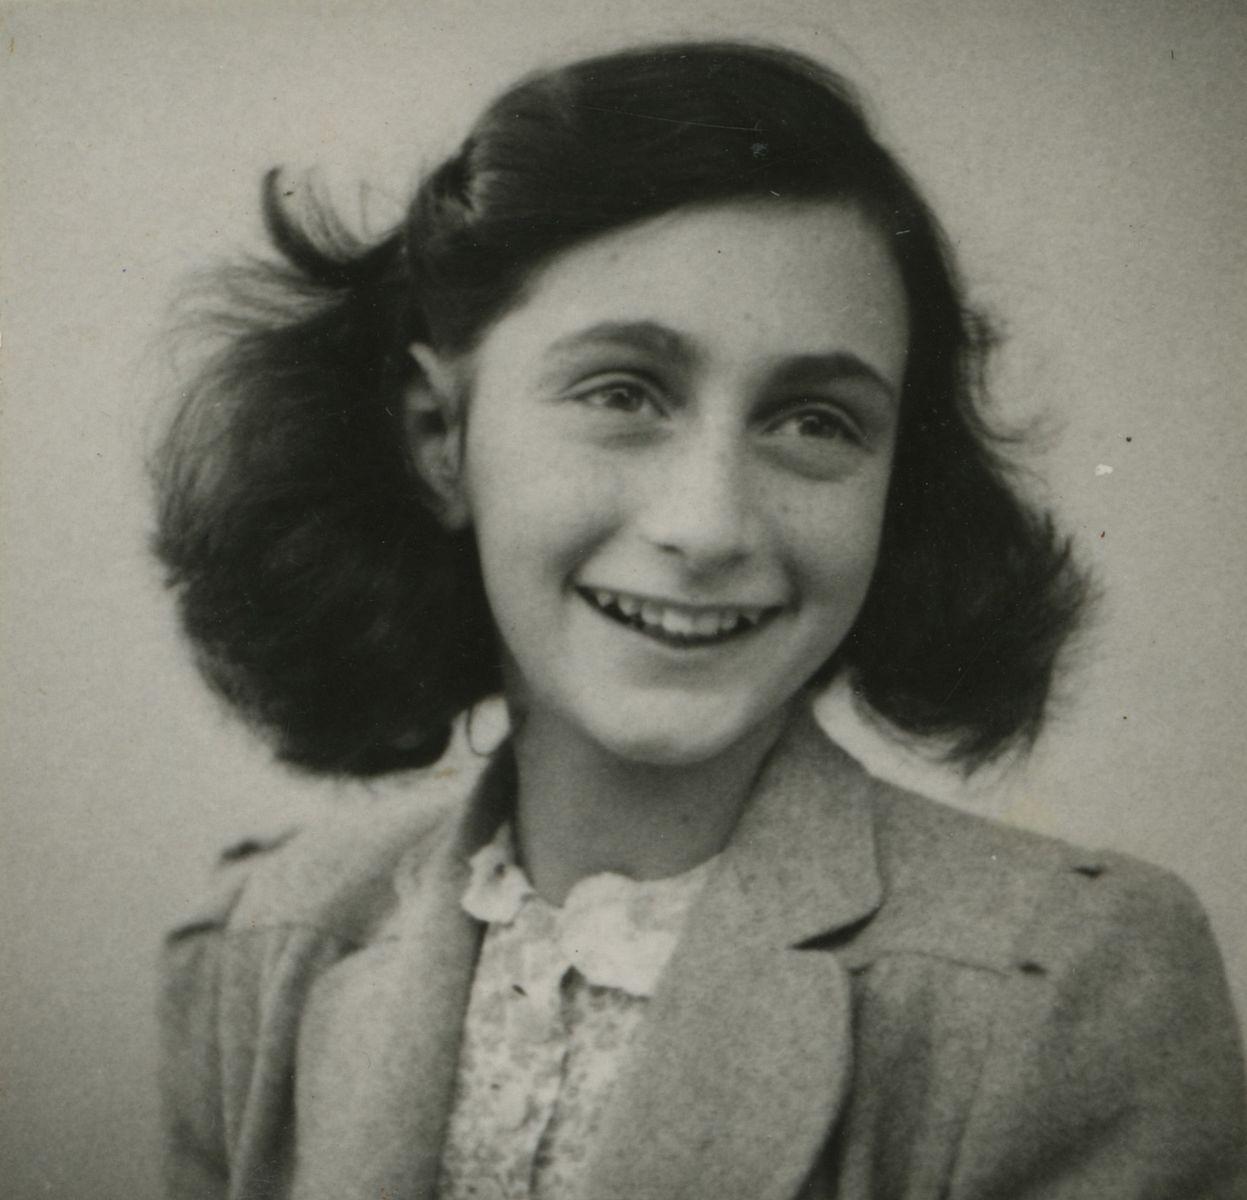 Foto: Fotosammlung des Anne Frank Hauses, Amsterdam